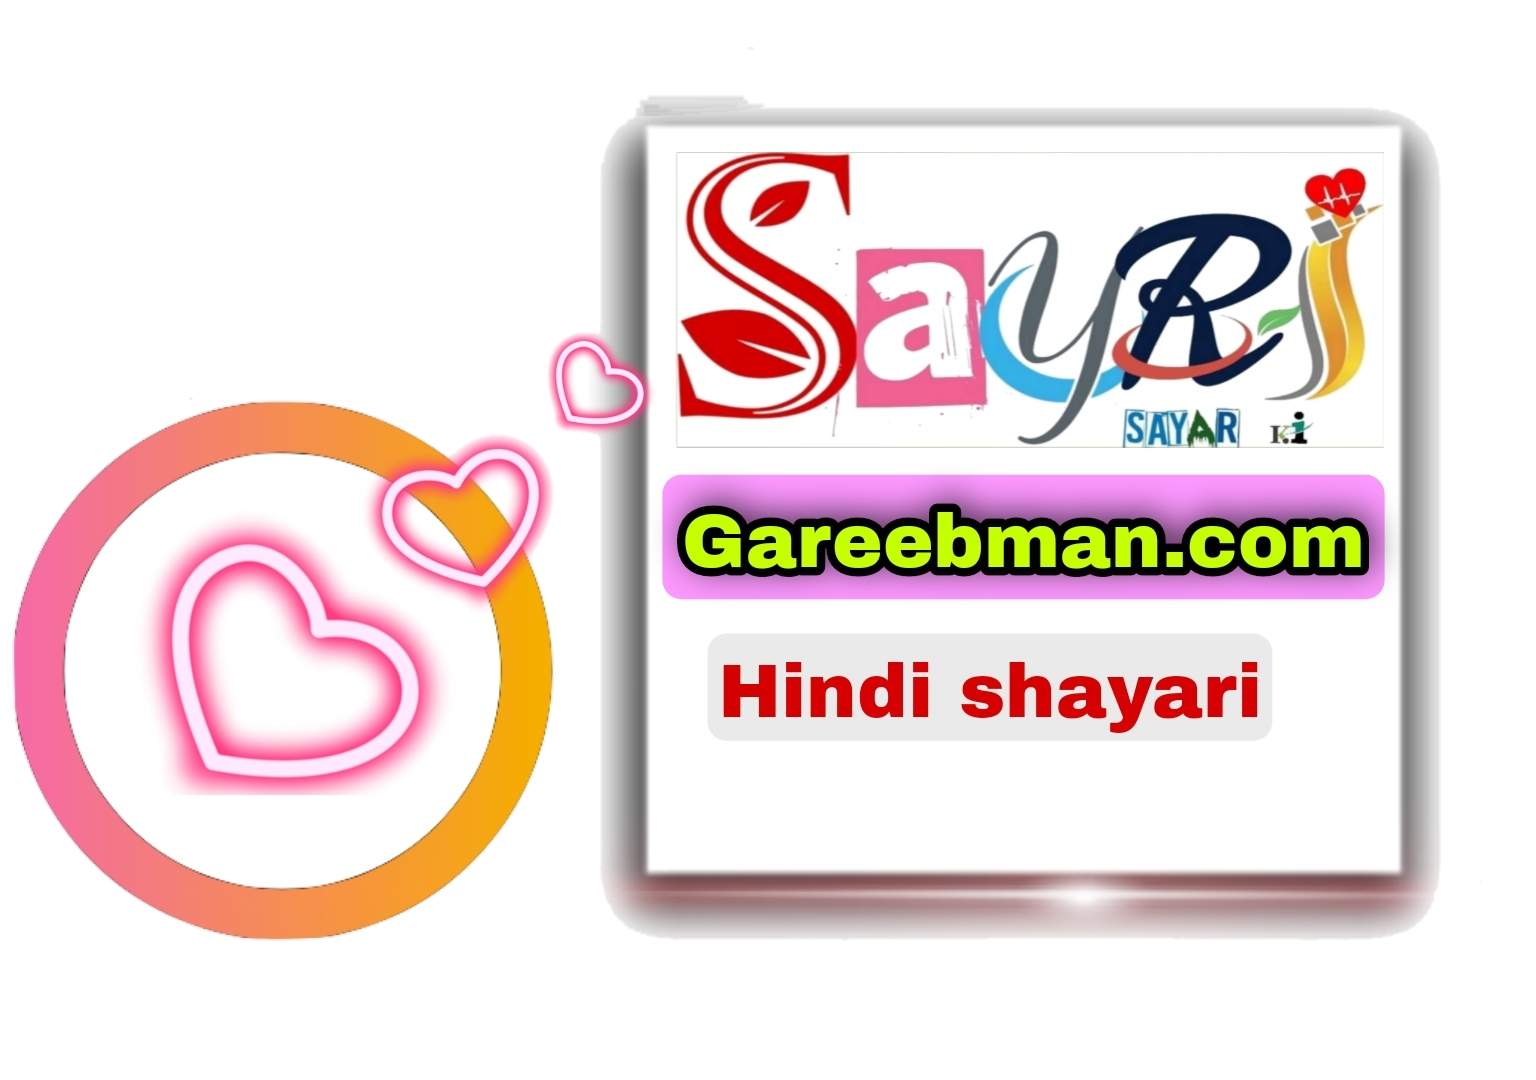 Gareebman.com